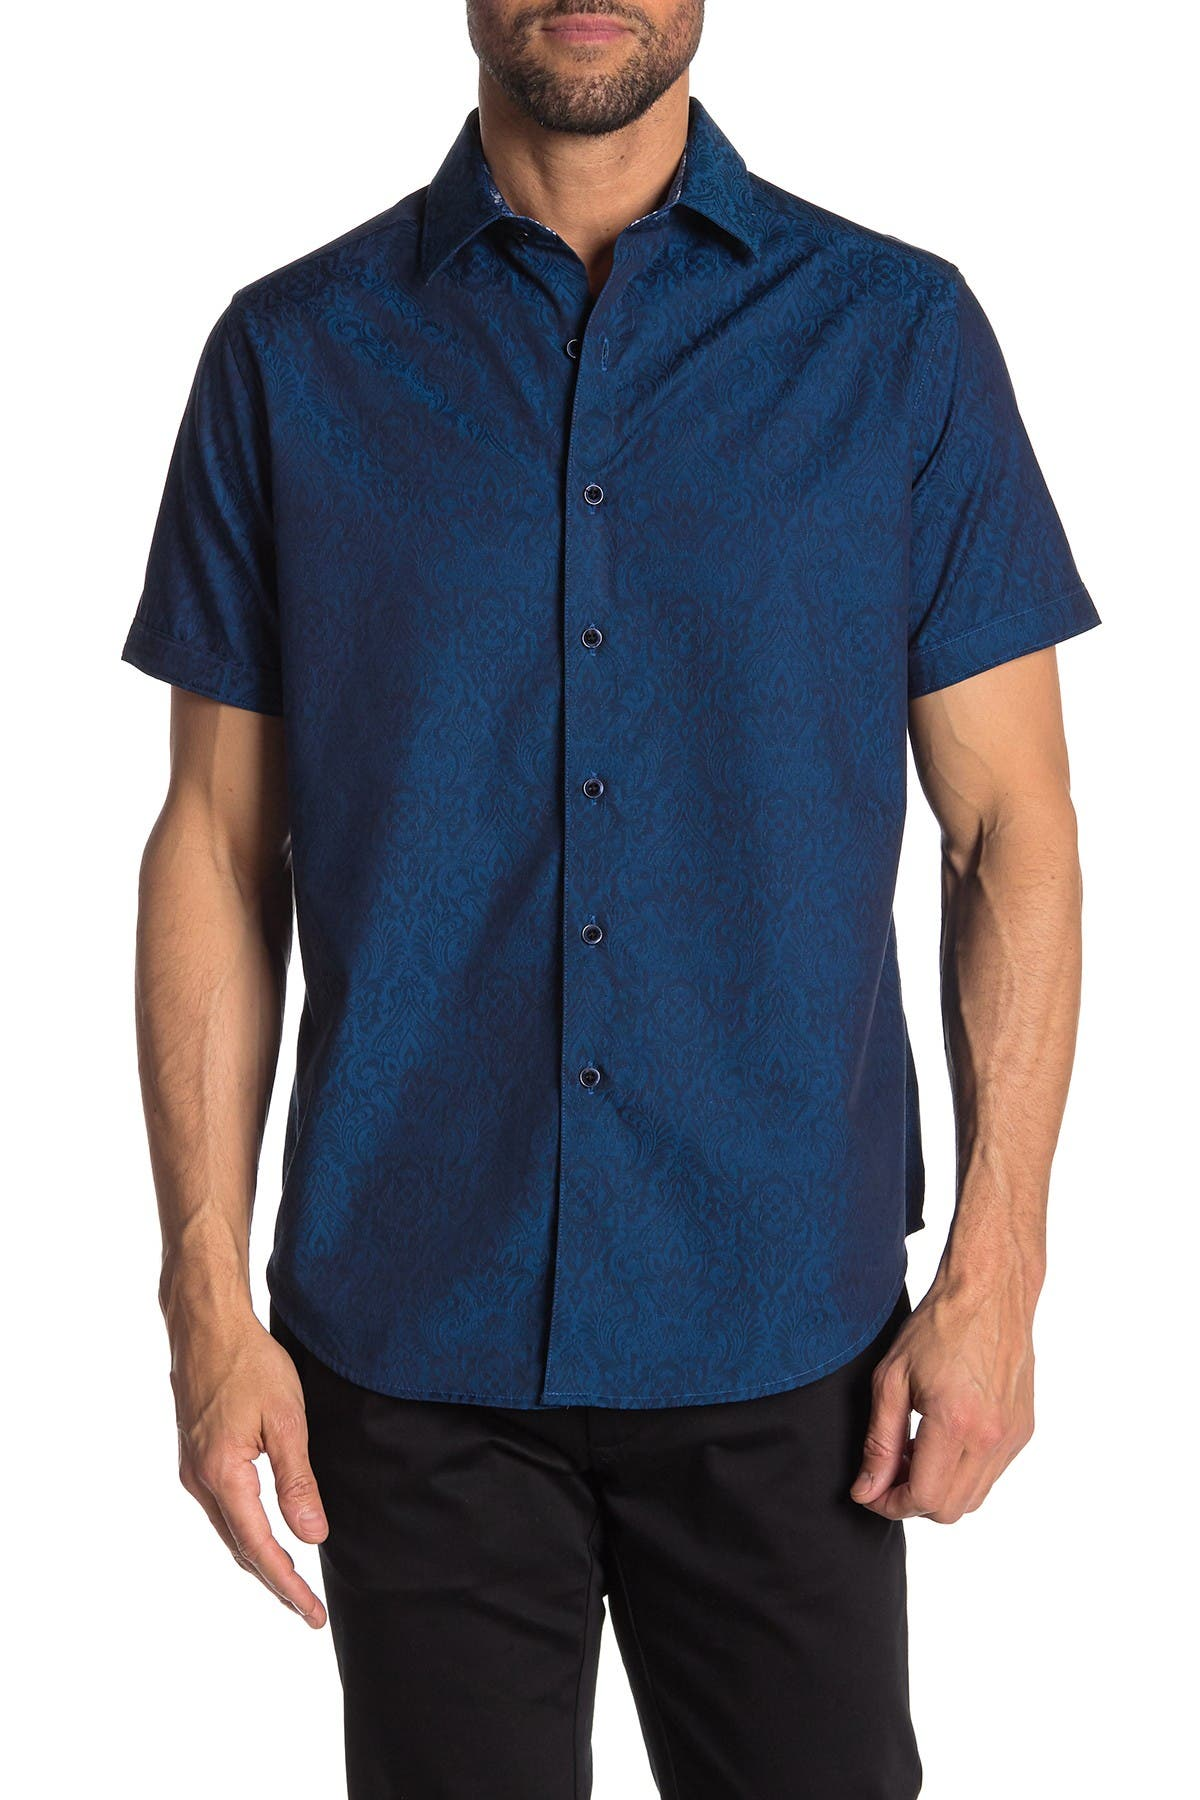 Image of Robert Graham Equinox Short Sleeve Classic Fit Shirt